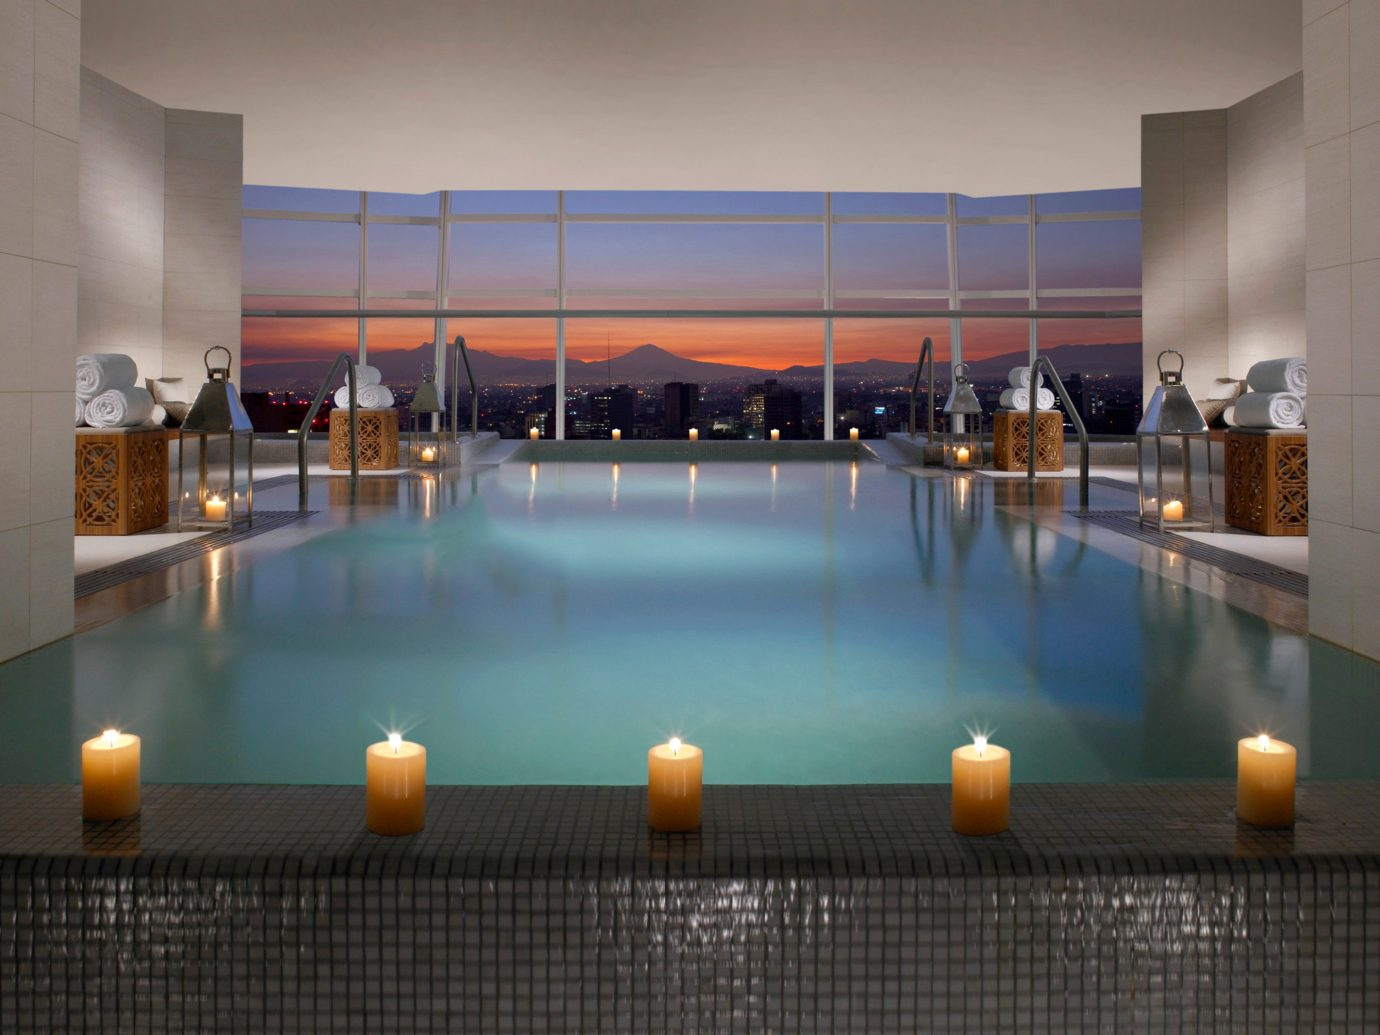 Hotels floor Lobby interior design swimming pool estate convention center orange Bar